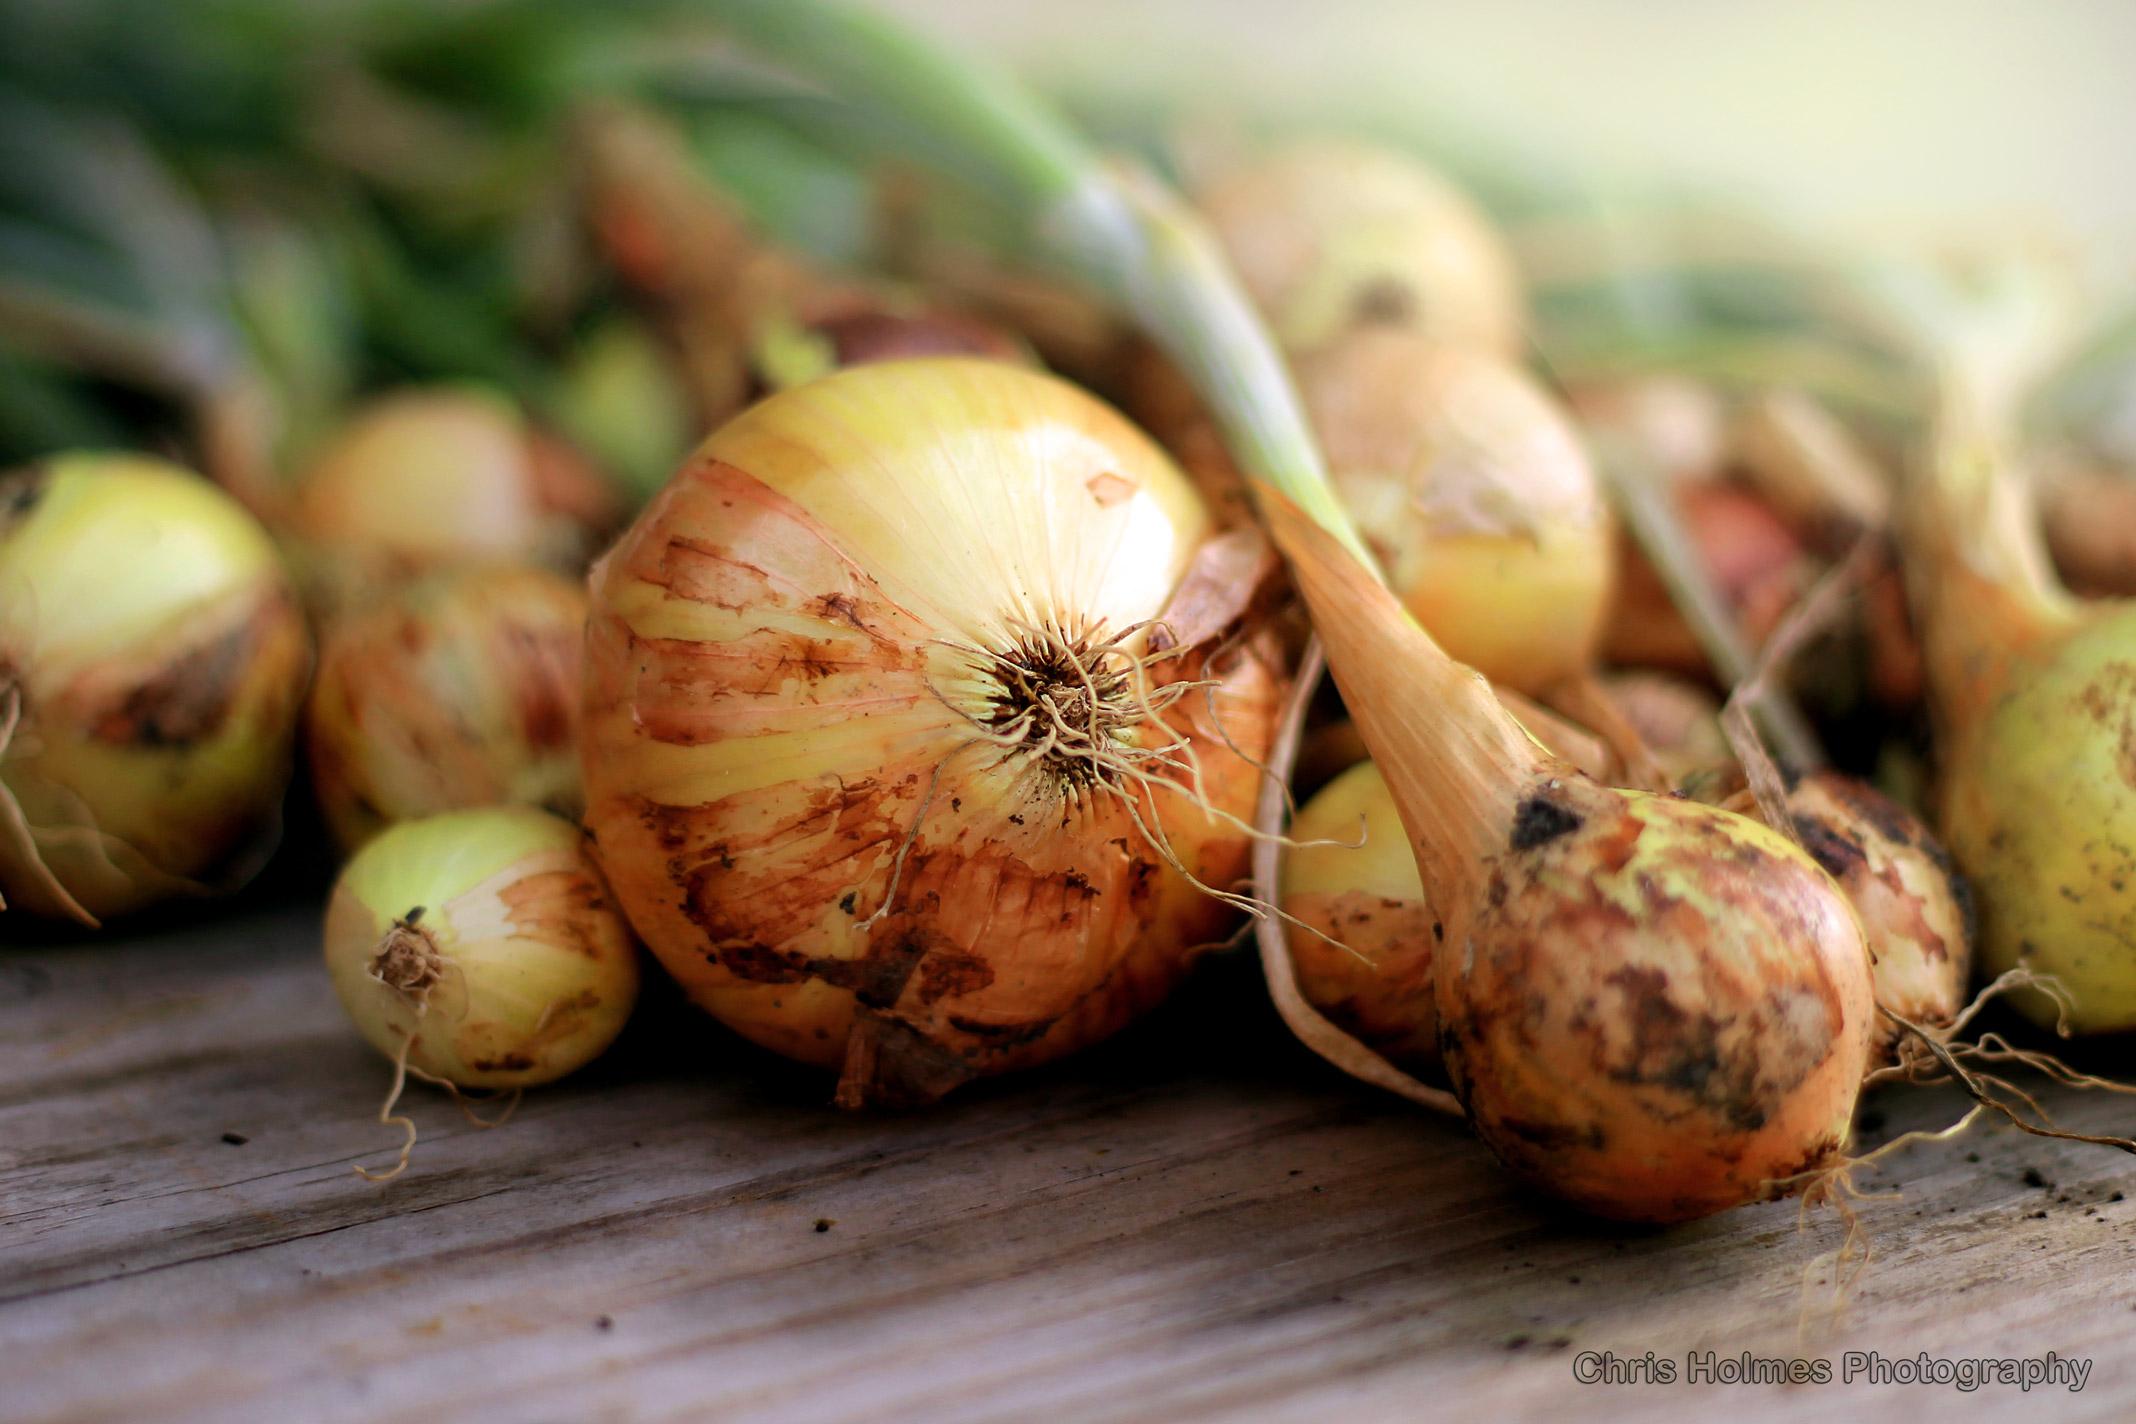 Onions-01.jpg